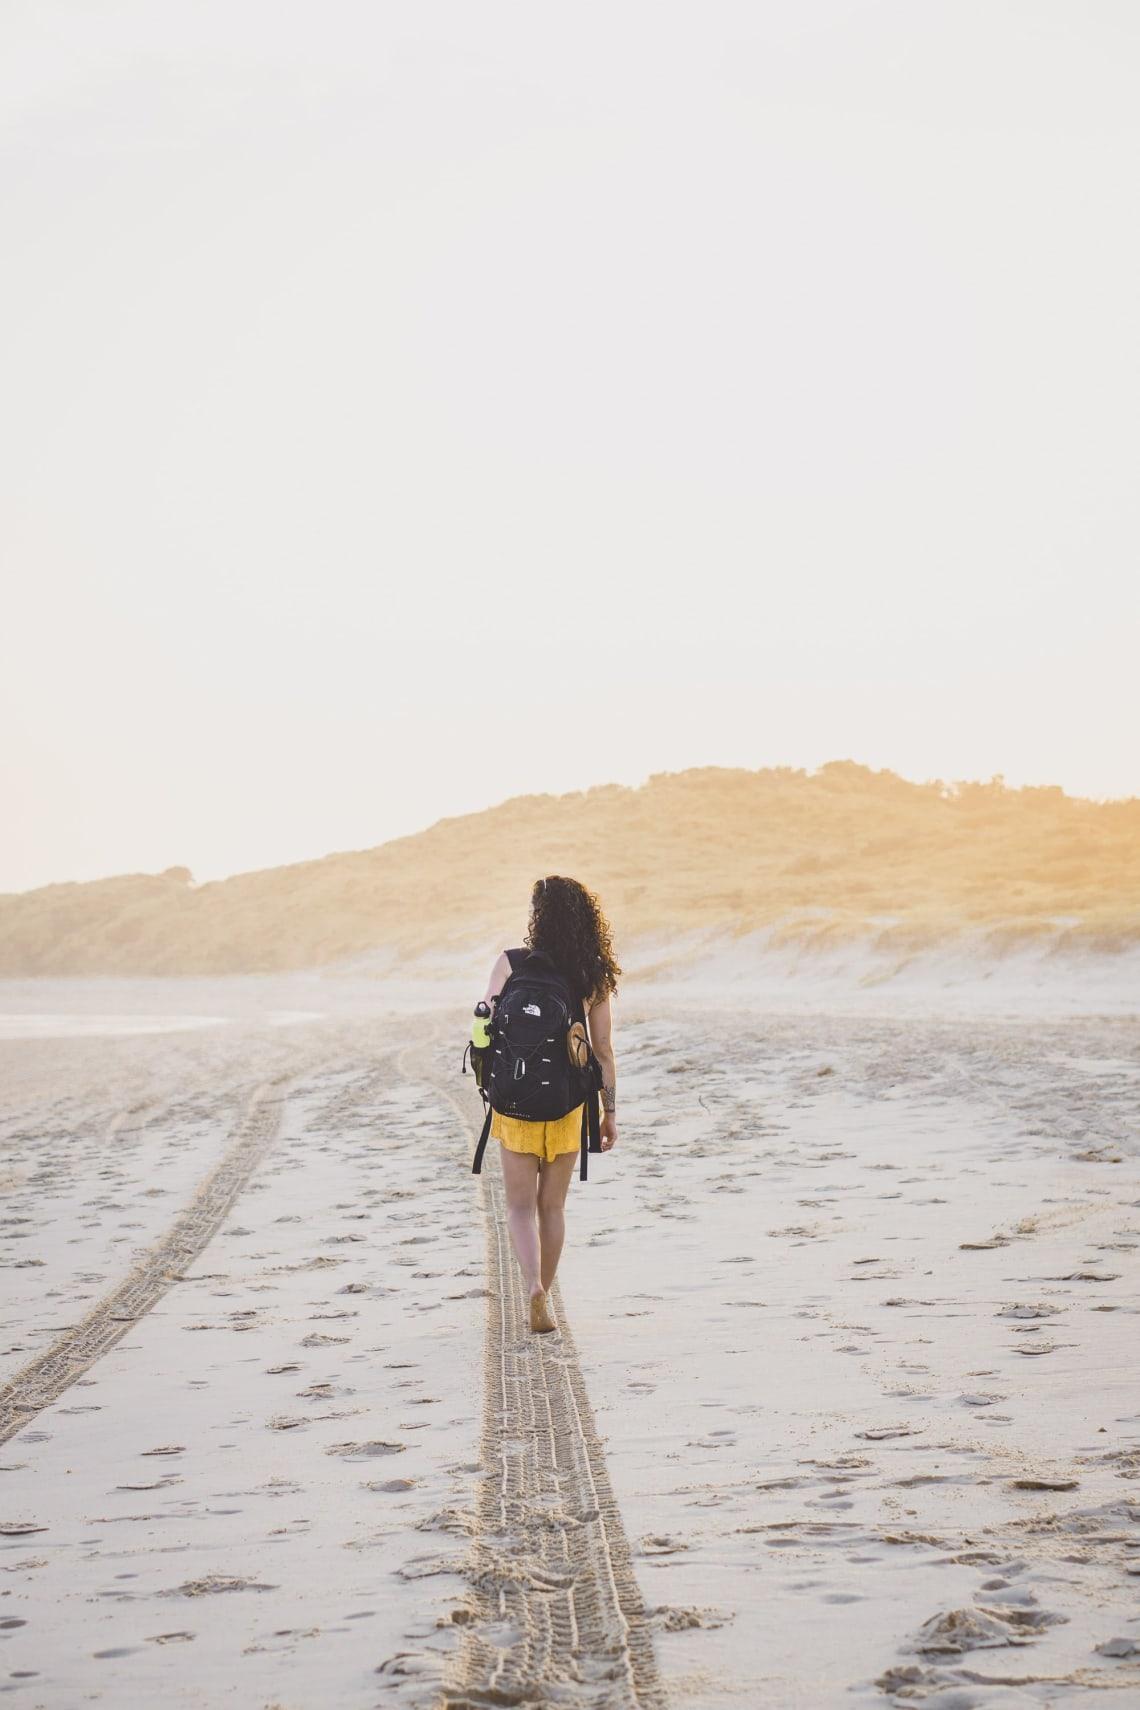 Solo female traveler, Australia